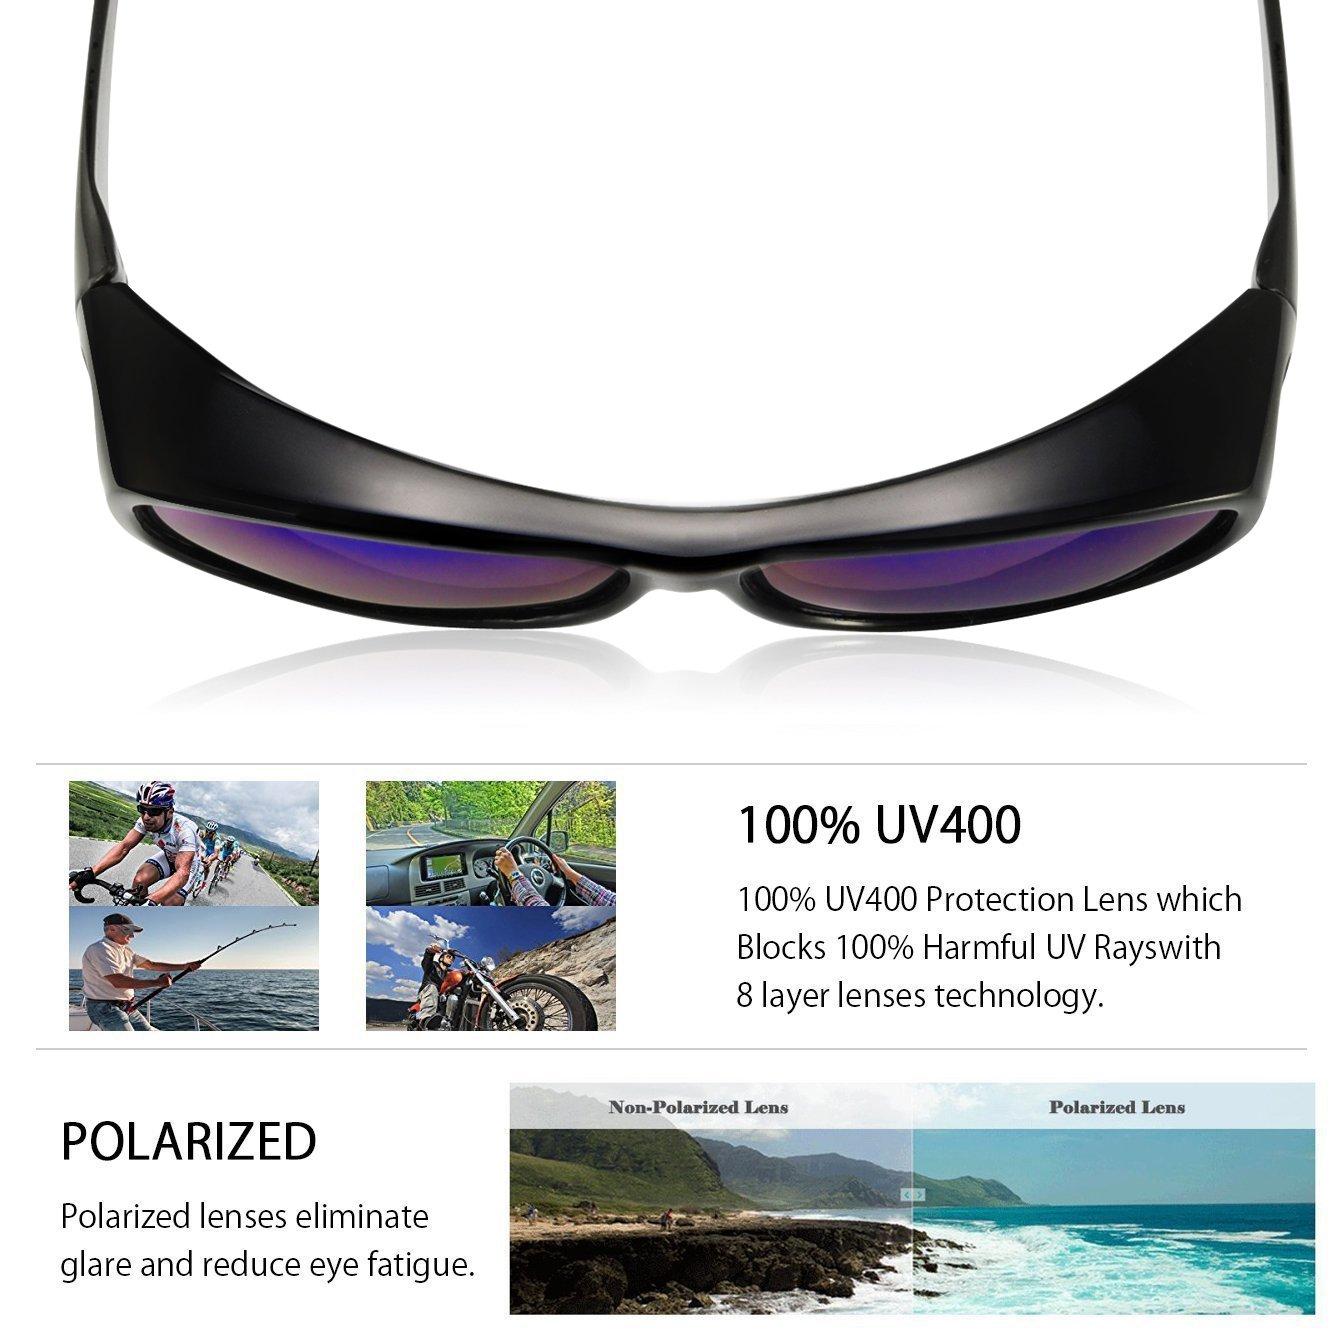 034b99b5ec98 Amazon.com: TINHAO Polarized Solar Shield Fitover Sunglasses - Wear Over  Prescription Glasses.Mirrored Lenses (Oval-Black, Blue): Sports & Outdoors